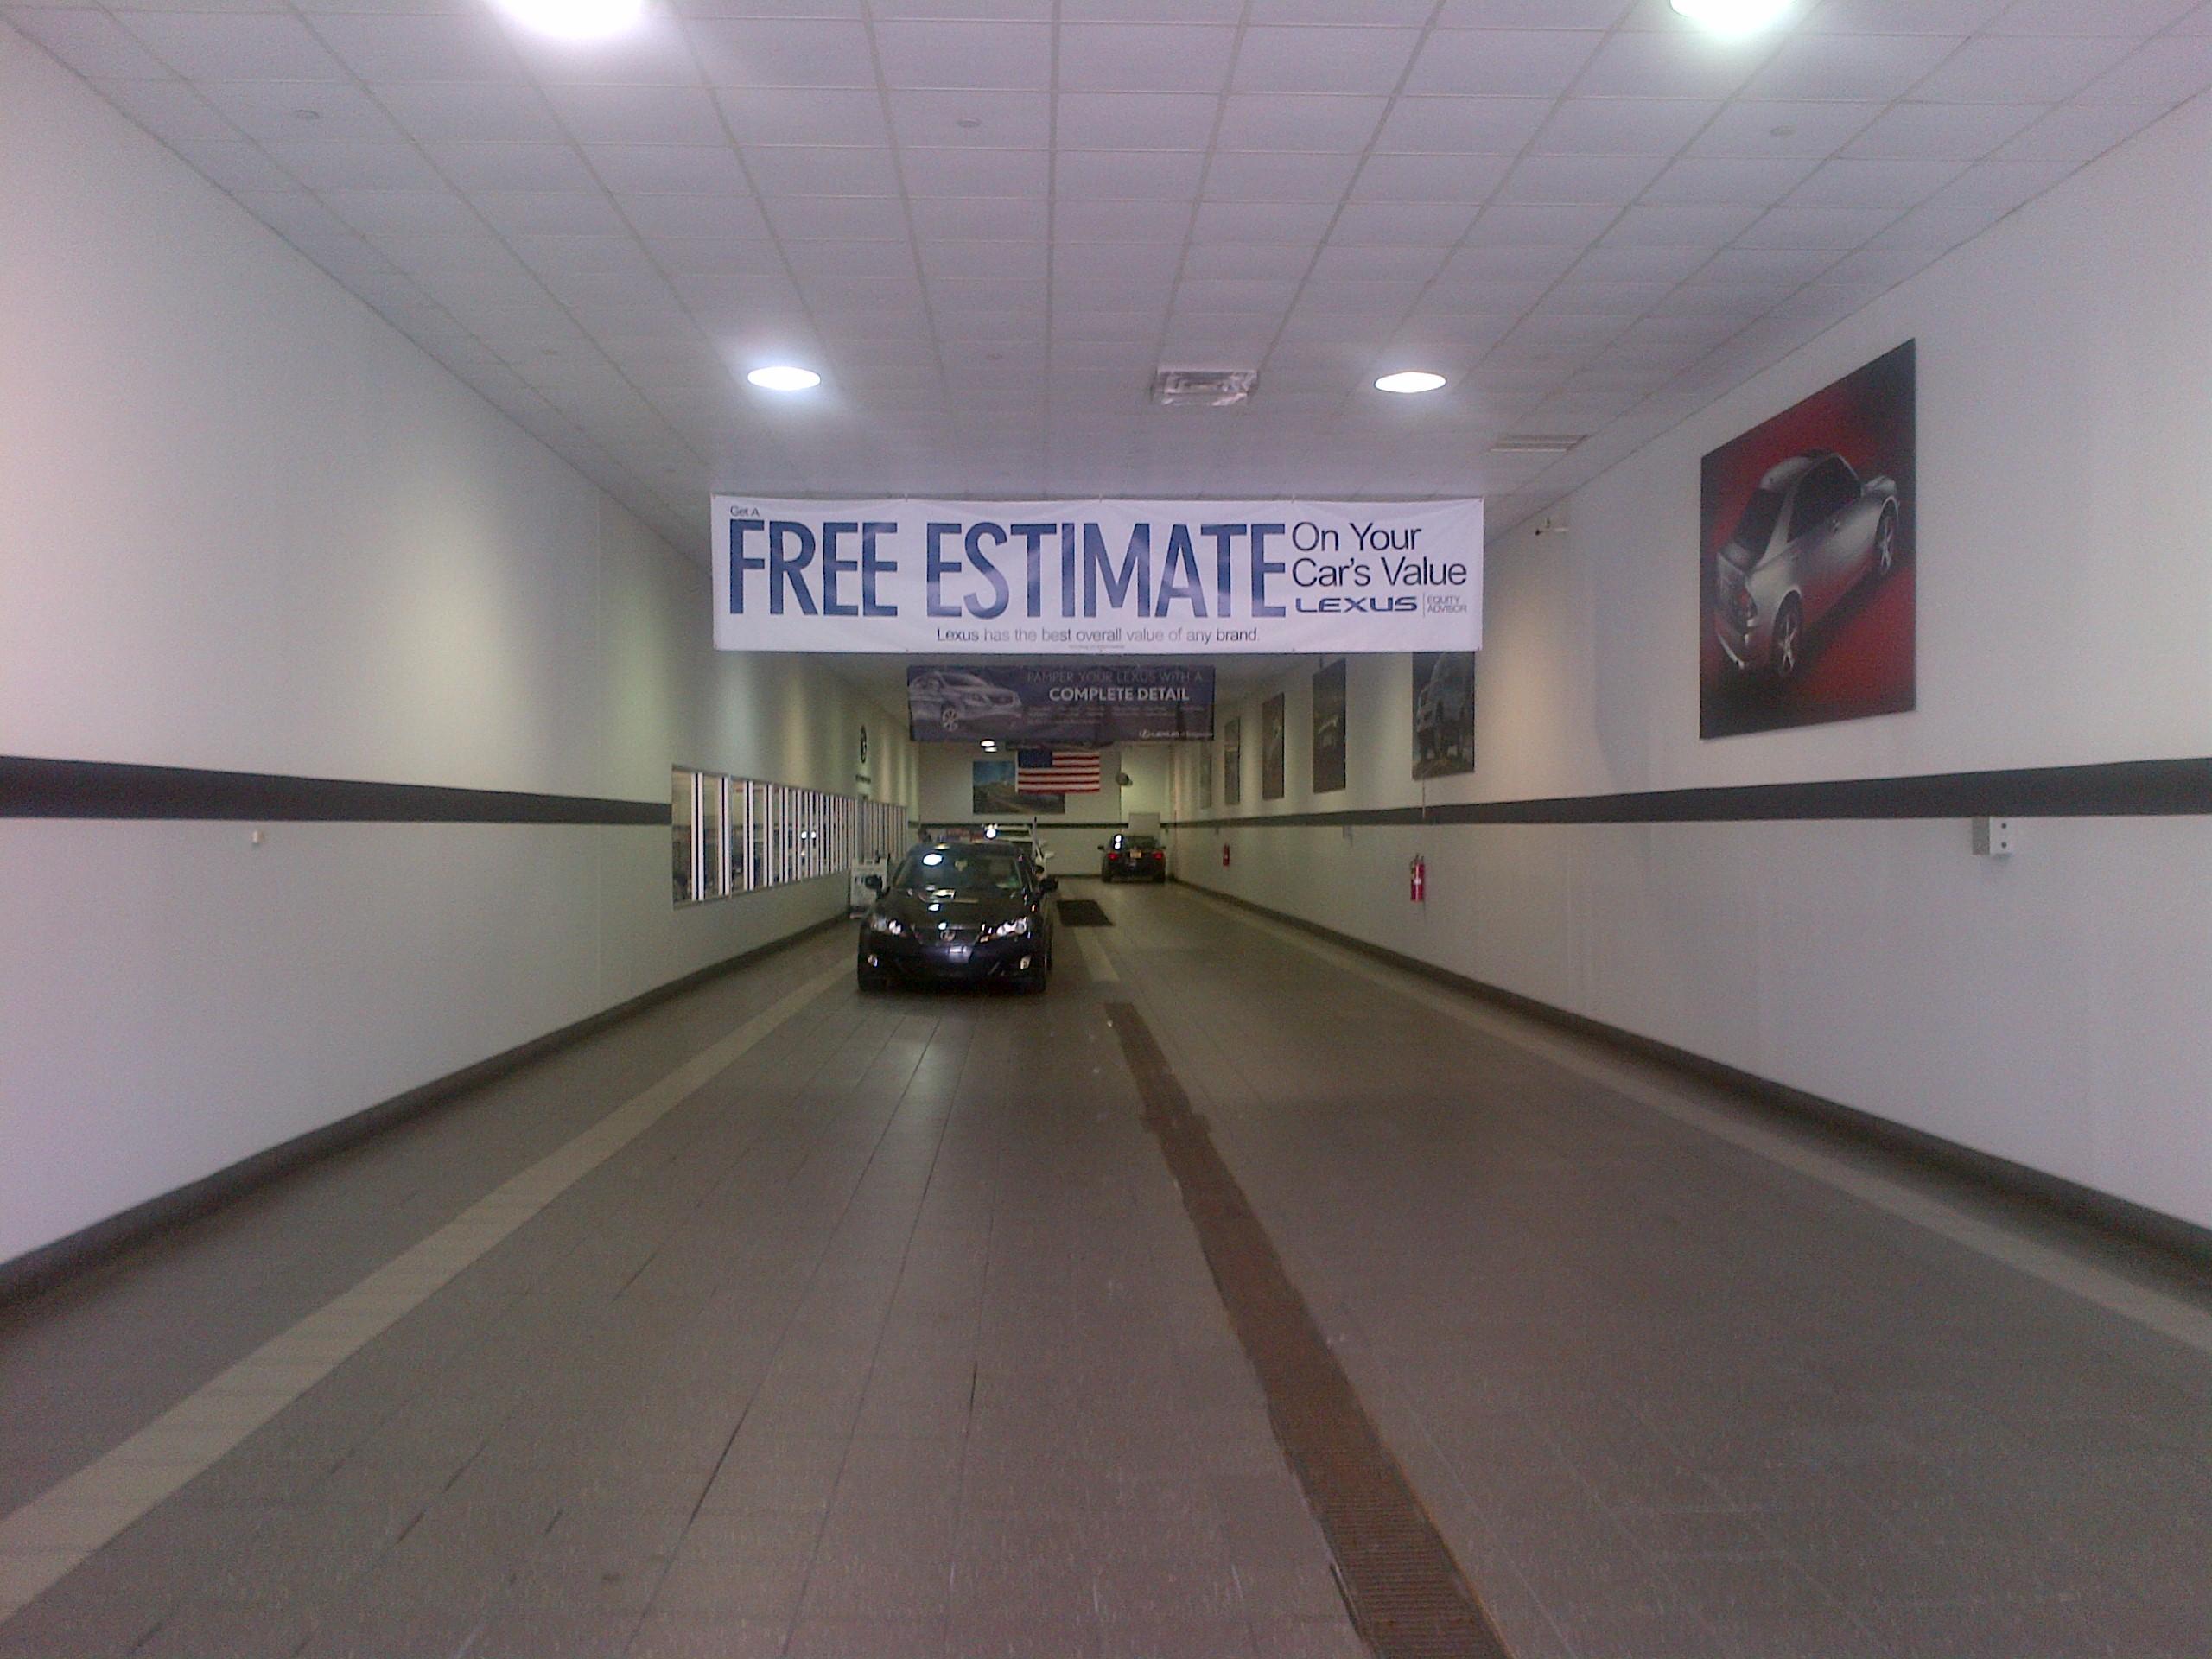 Lexus Of Bridgewater >> Lexus Dealership Sells Out of The Service Lane - Strong ...